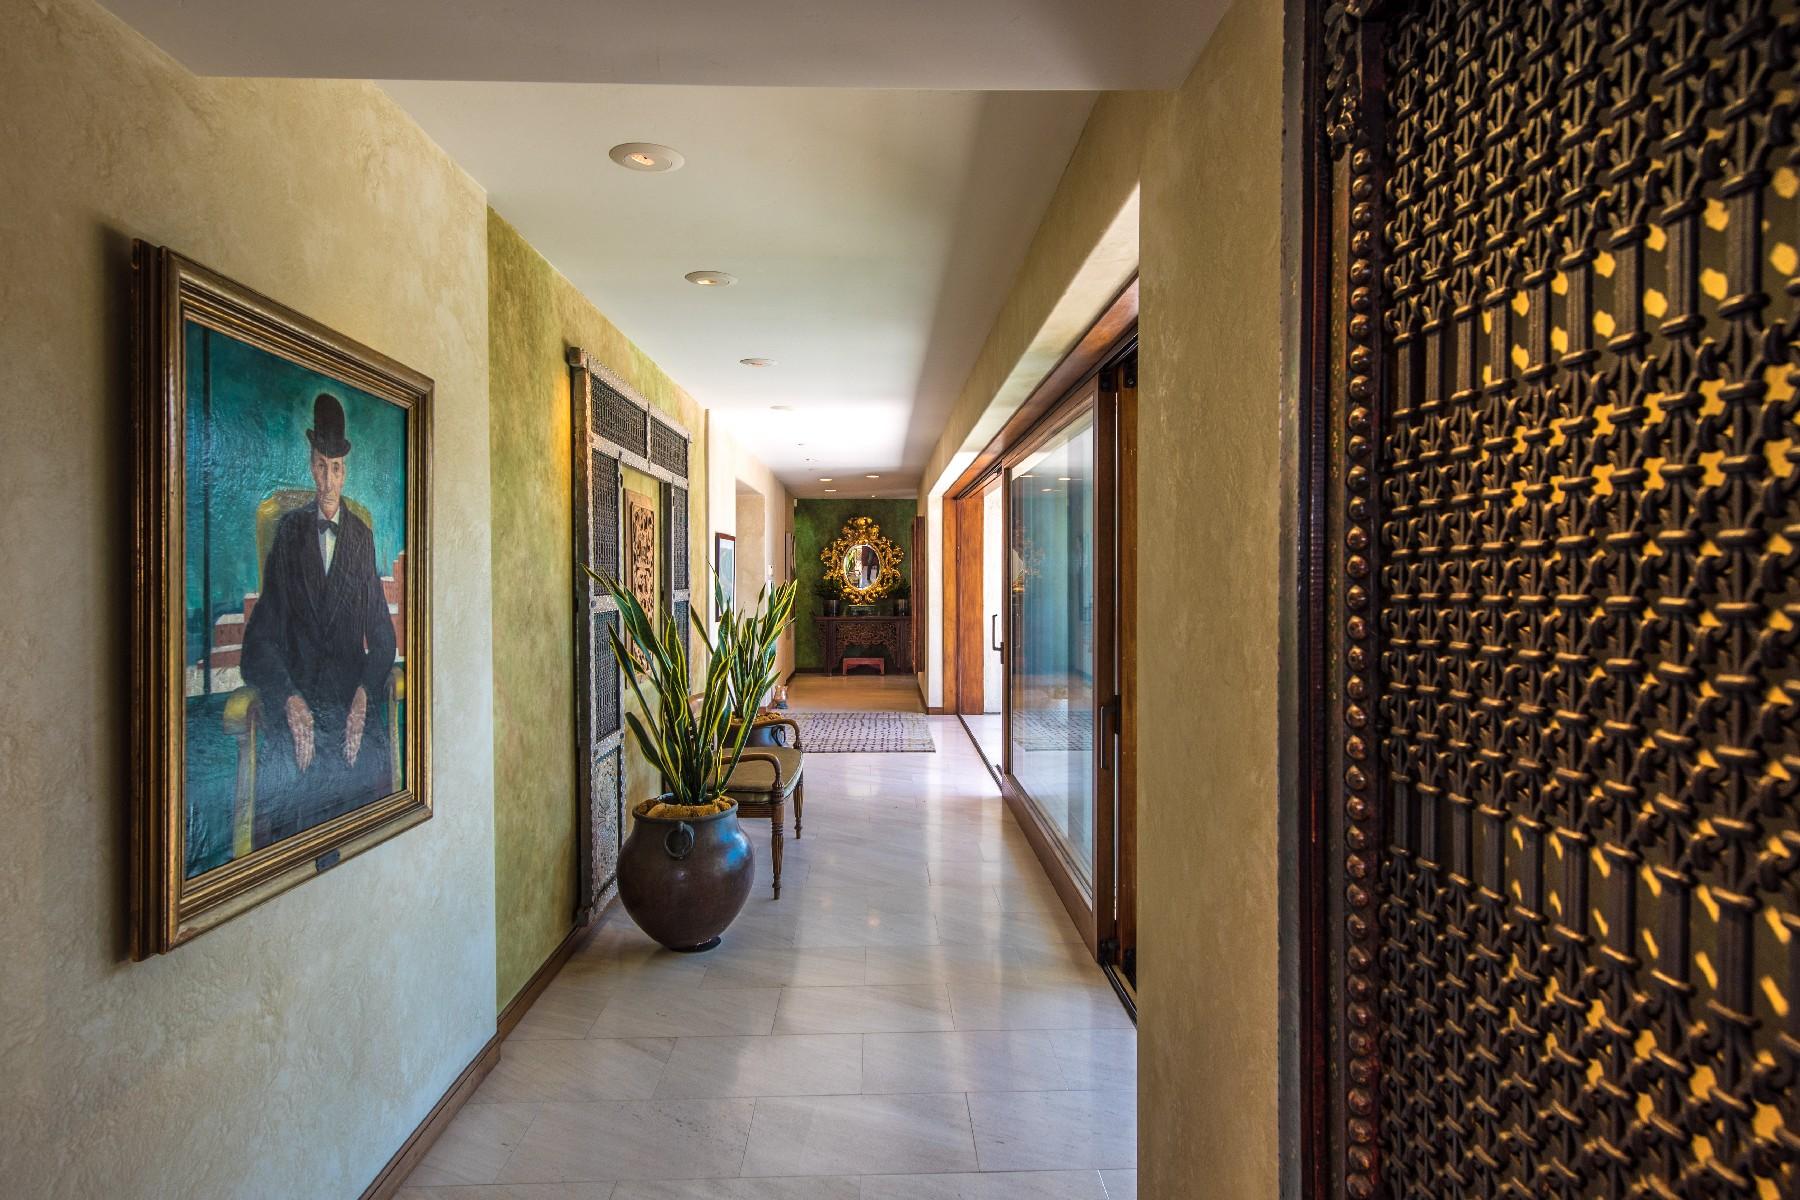 Additional photo for property listing at 5979 Rancho Diegueno  Rancho Santa Fe, Californie 92067 États-Unis